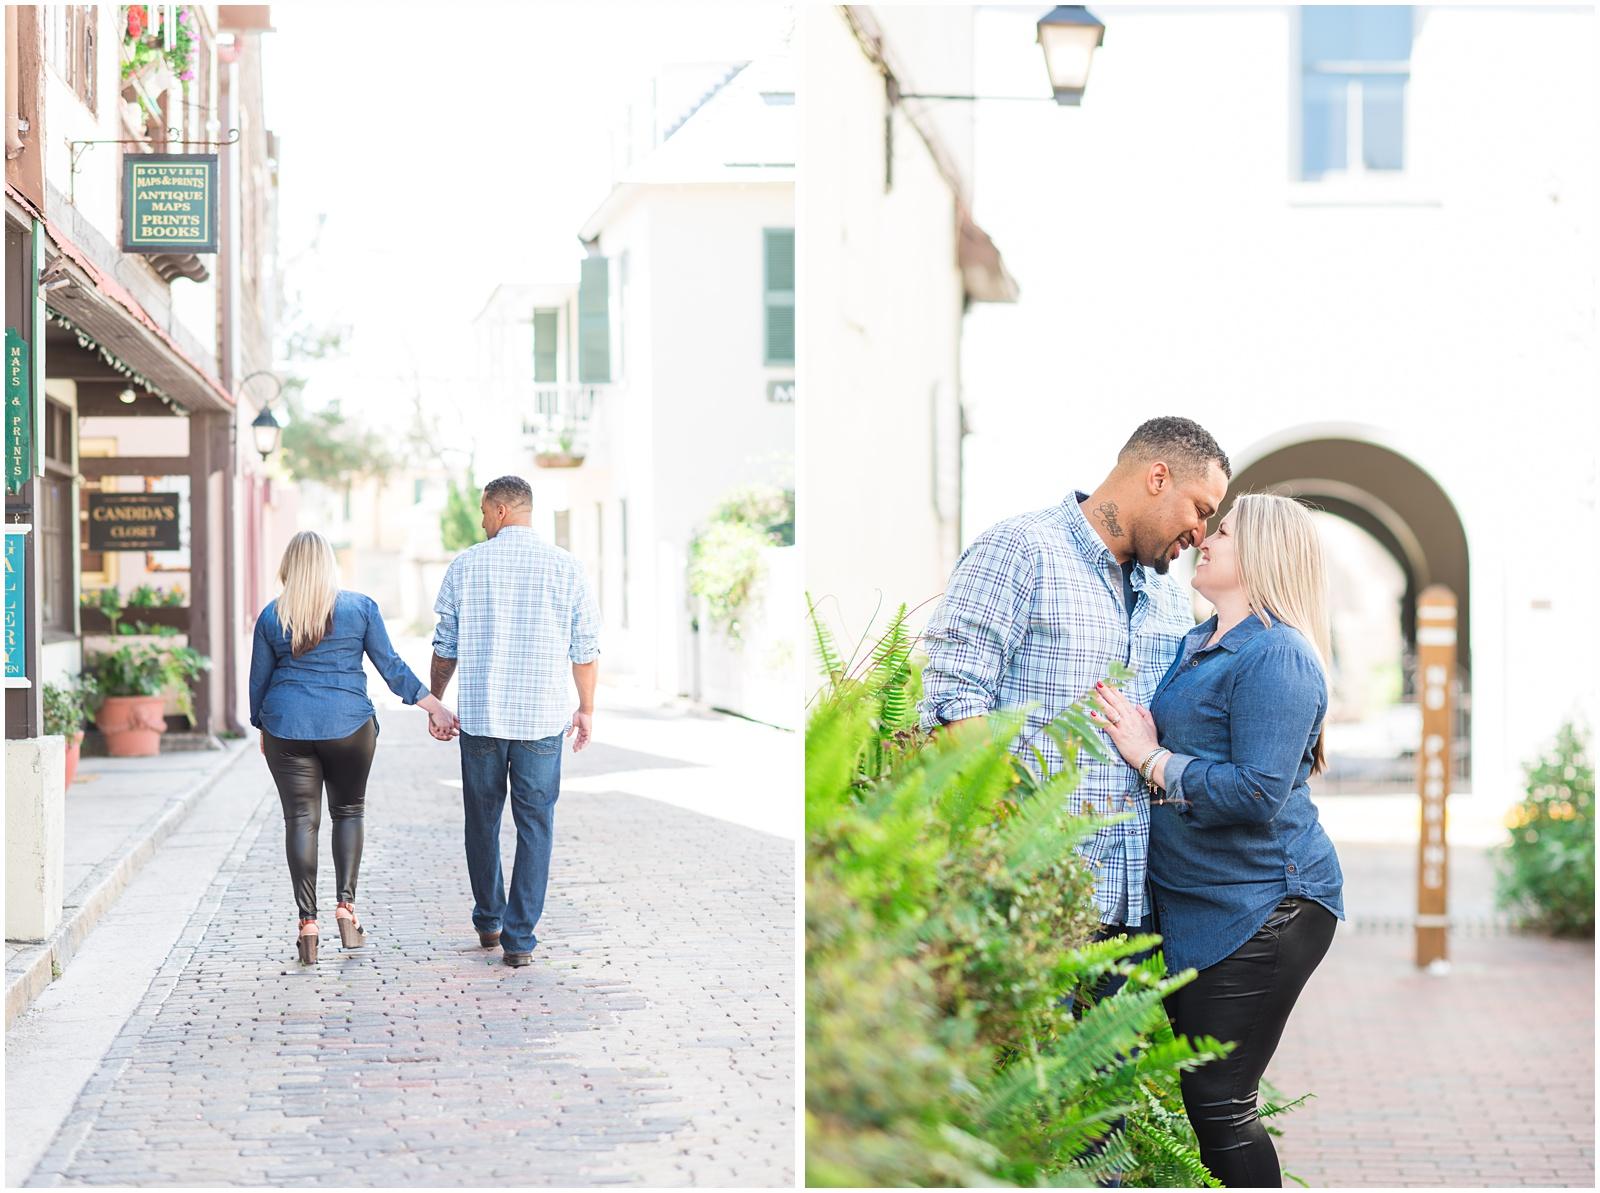 St Augustine_Florida_Engagement_Portraits_5.jpg